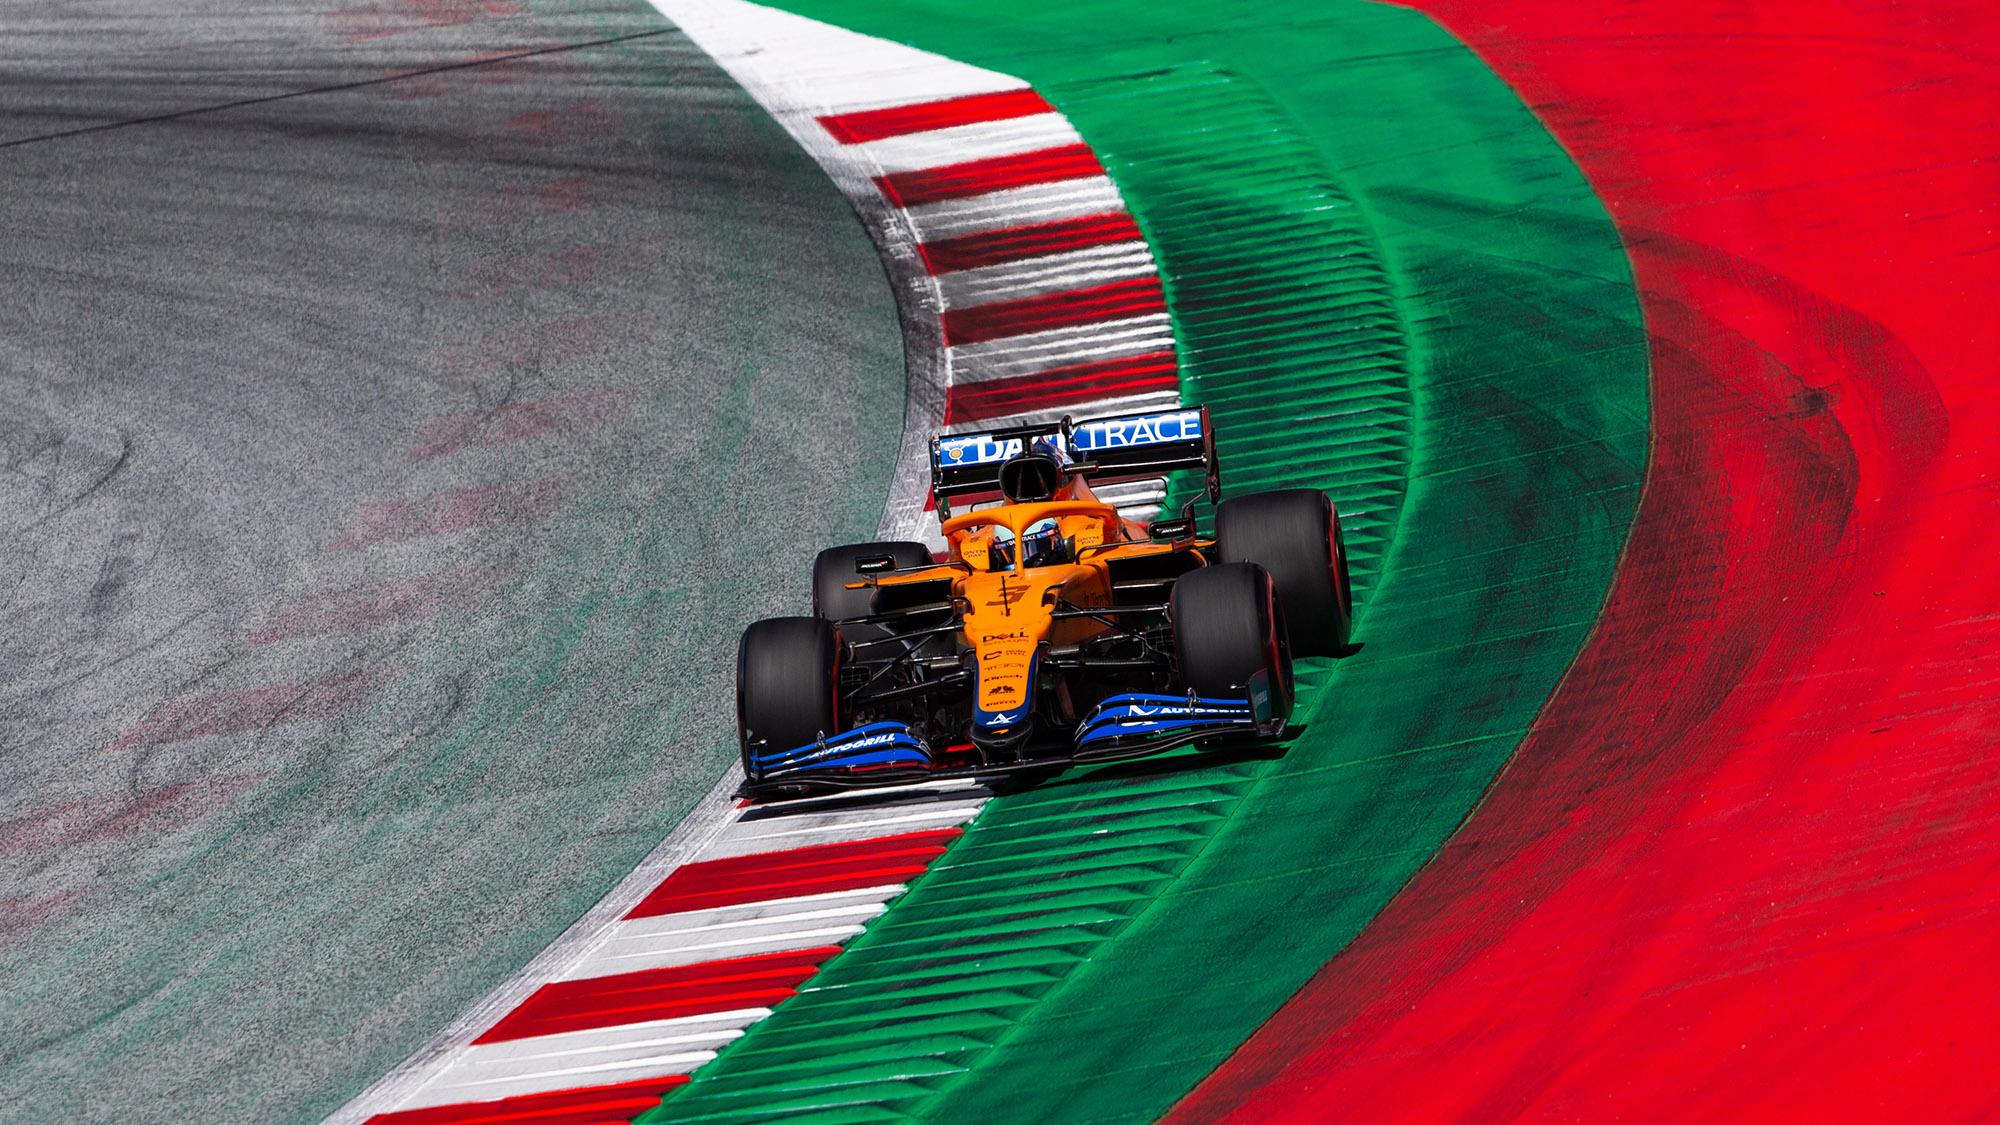 Daniel Ricciardo in qualifying for the 2021 Styrian Grand Prix